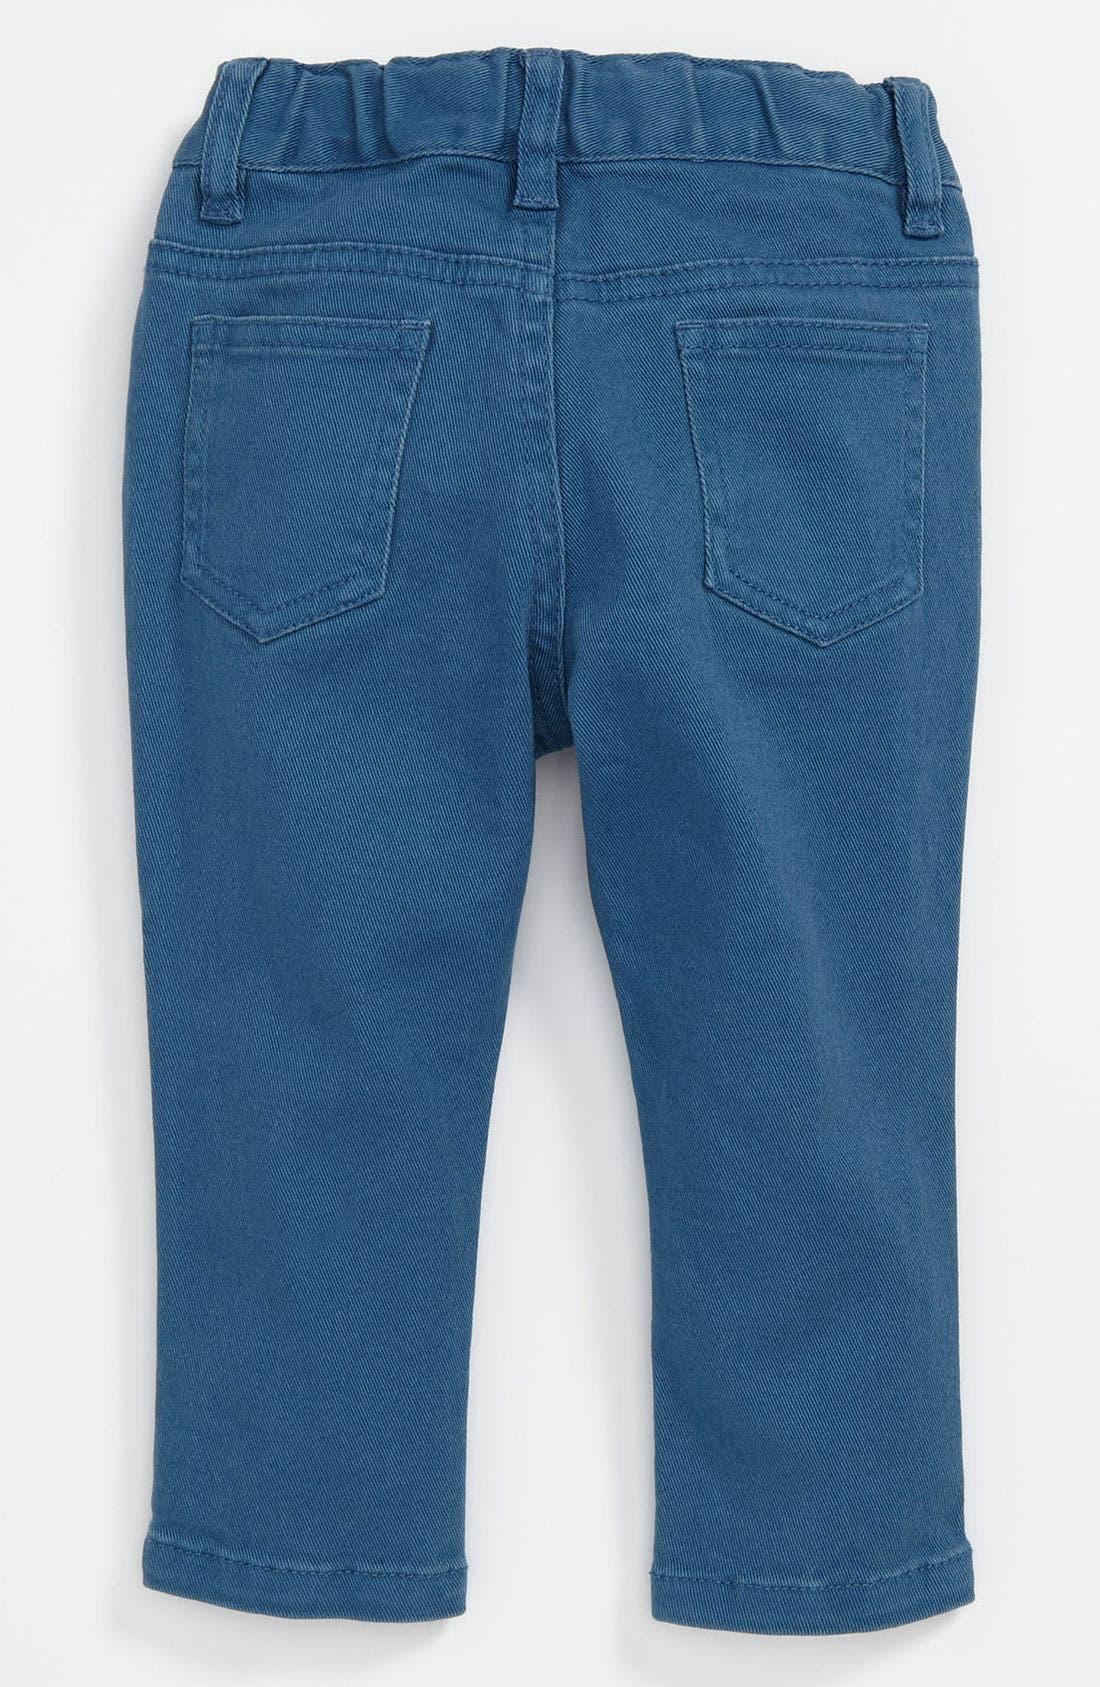 Alternate Image 1 Selected - Pumpkin Patch 'Slim Fit' Color Jeans (Toddler)